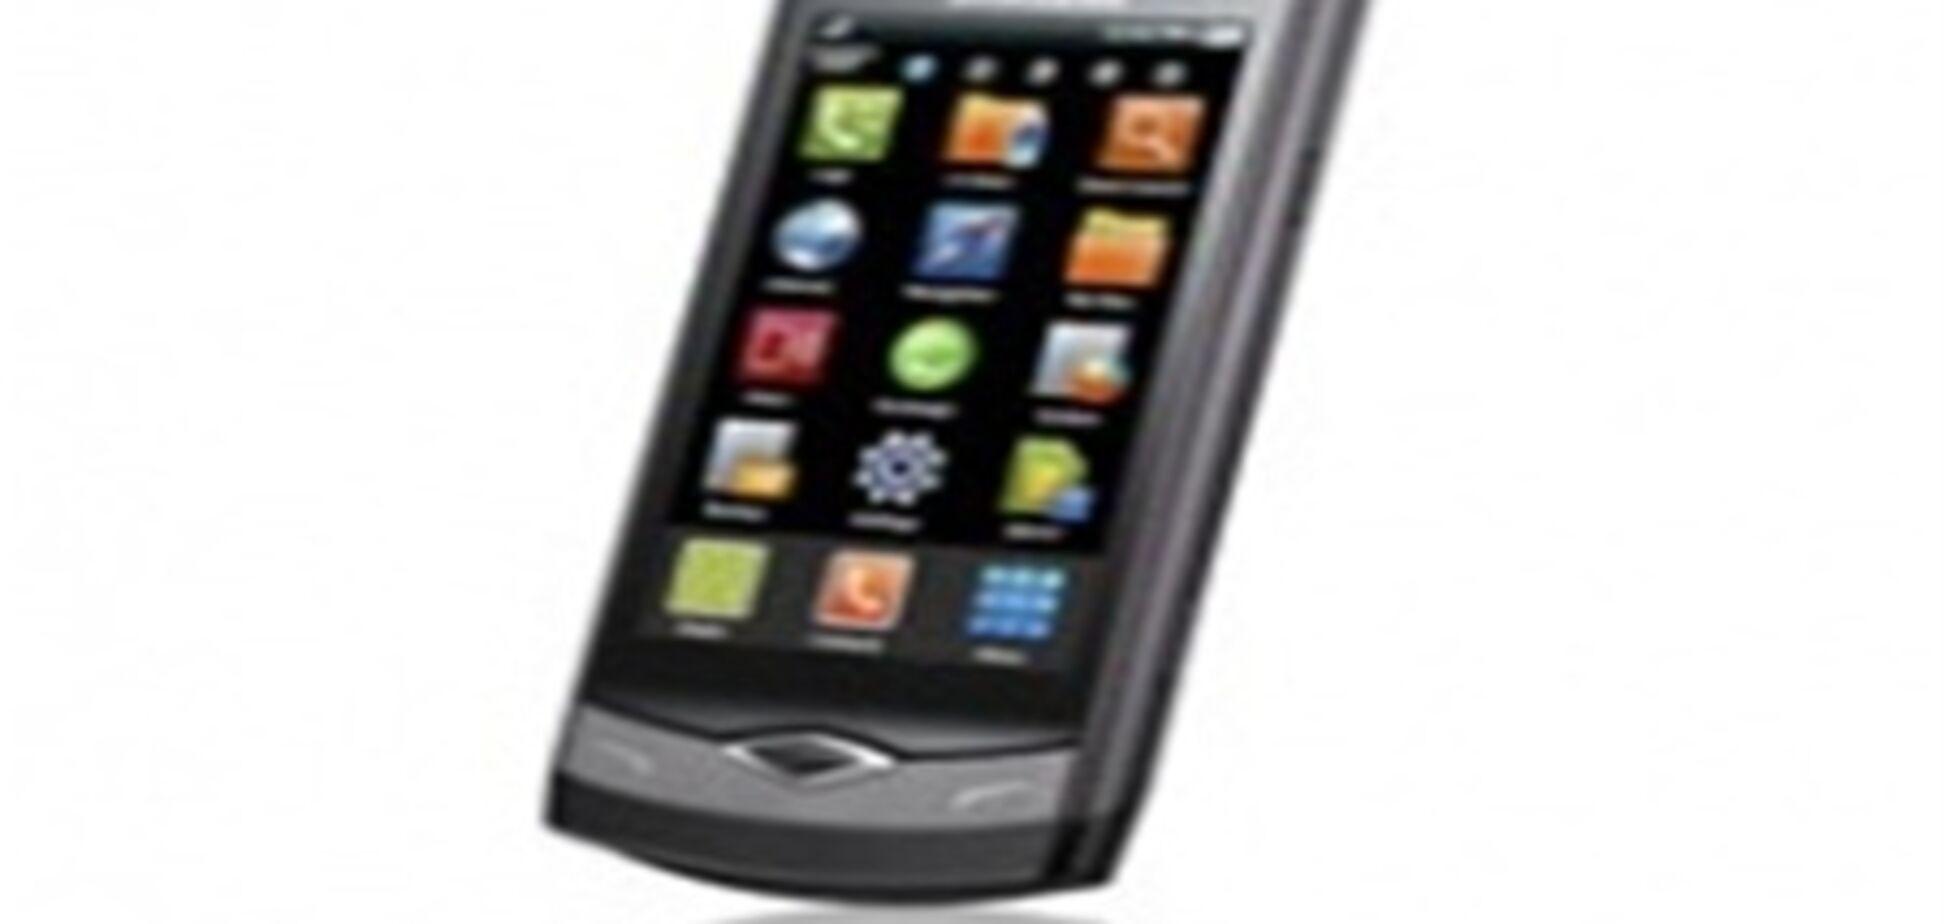 Mobile World Congress 2010: Samsung показала телефон на базе платформы Samsung bada